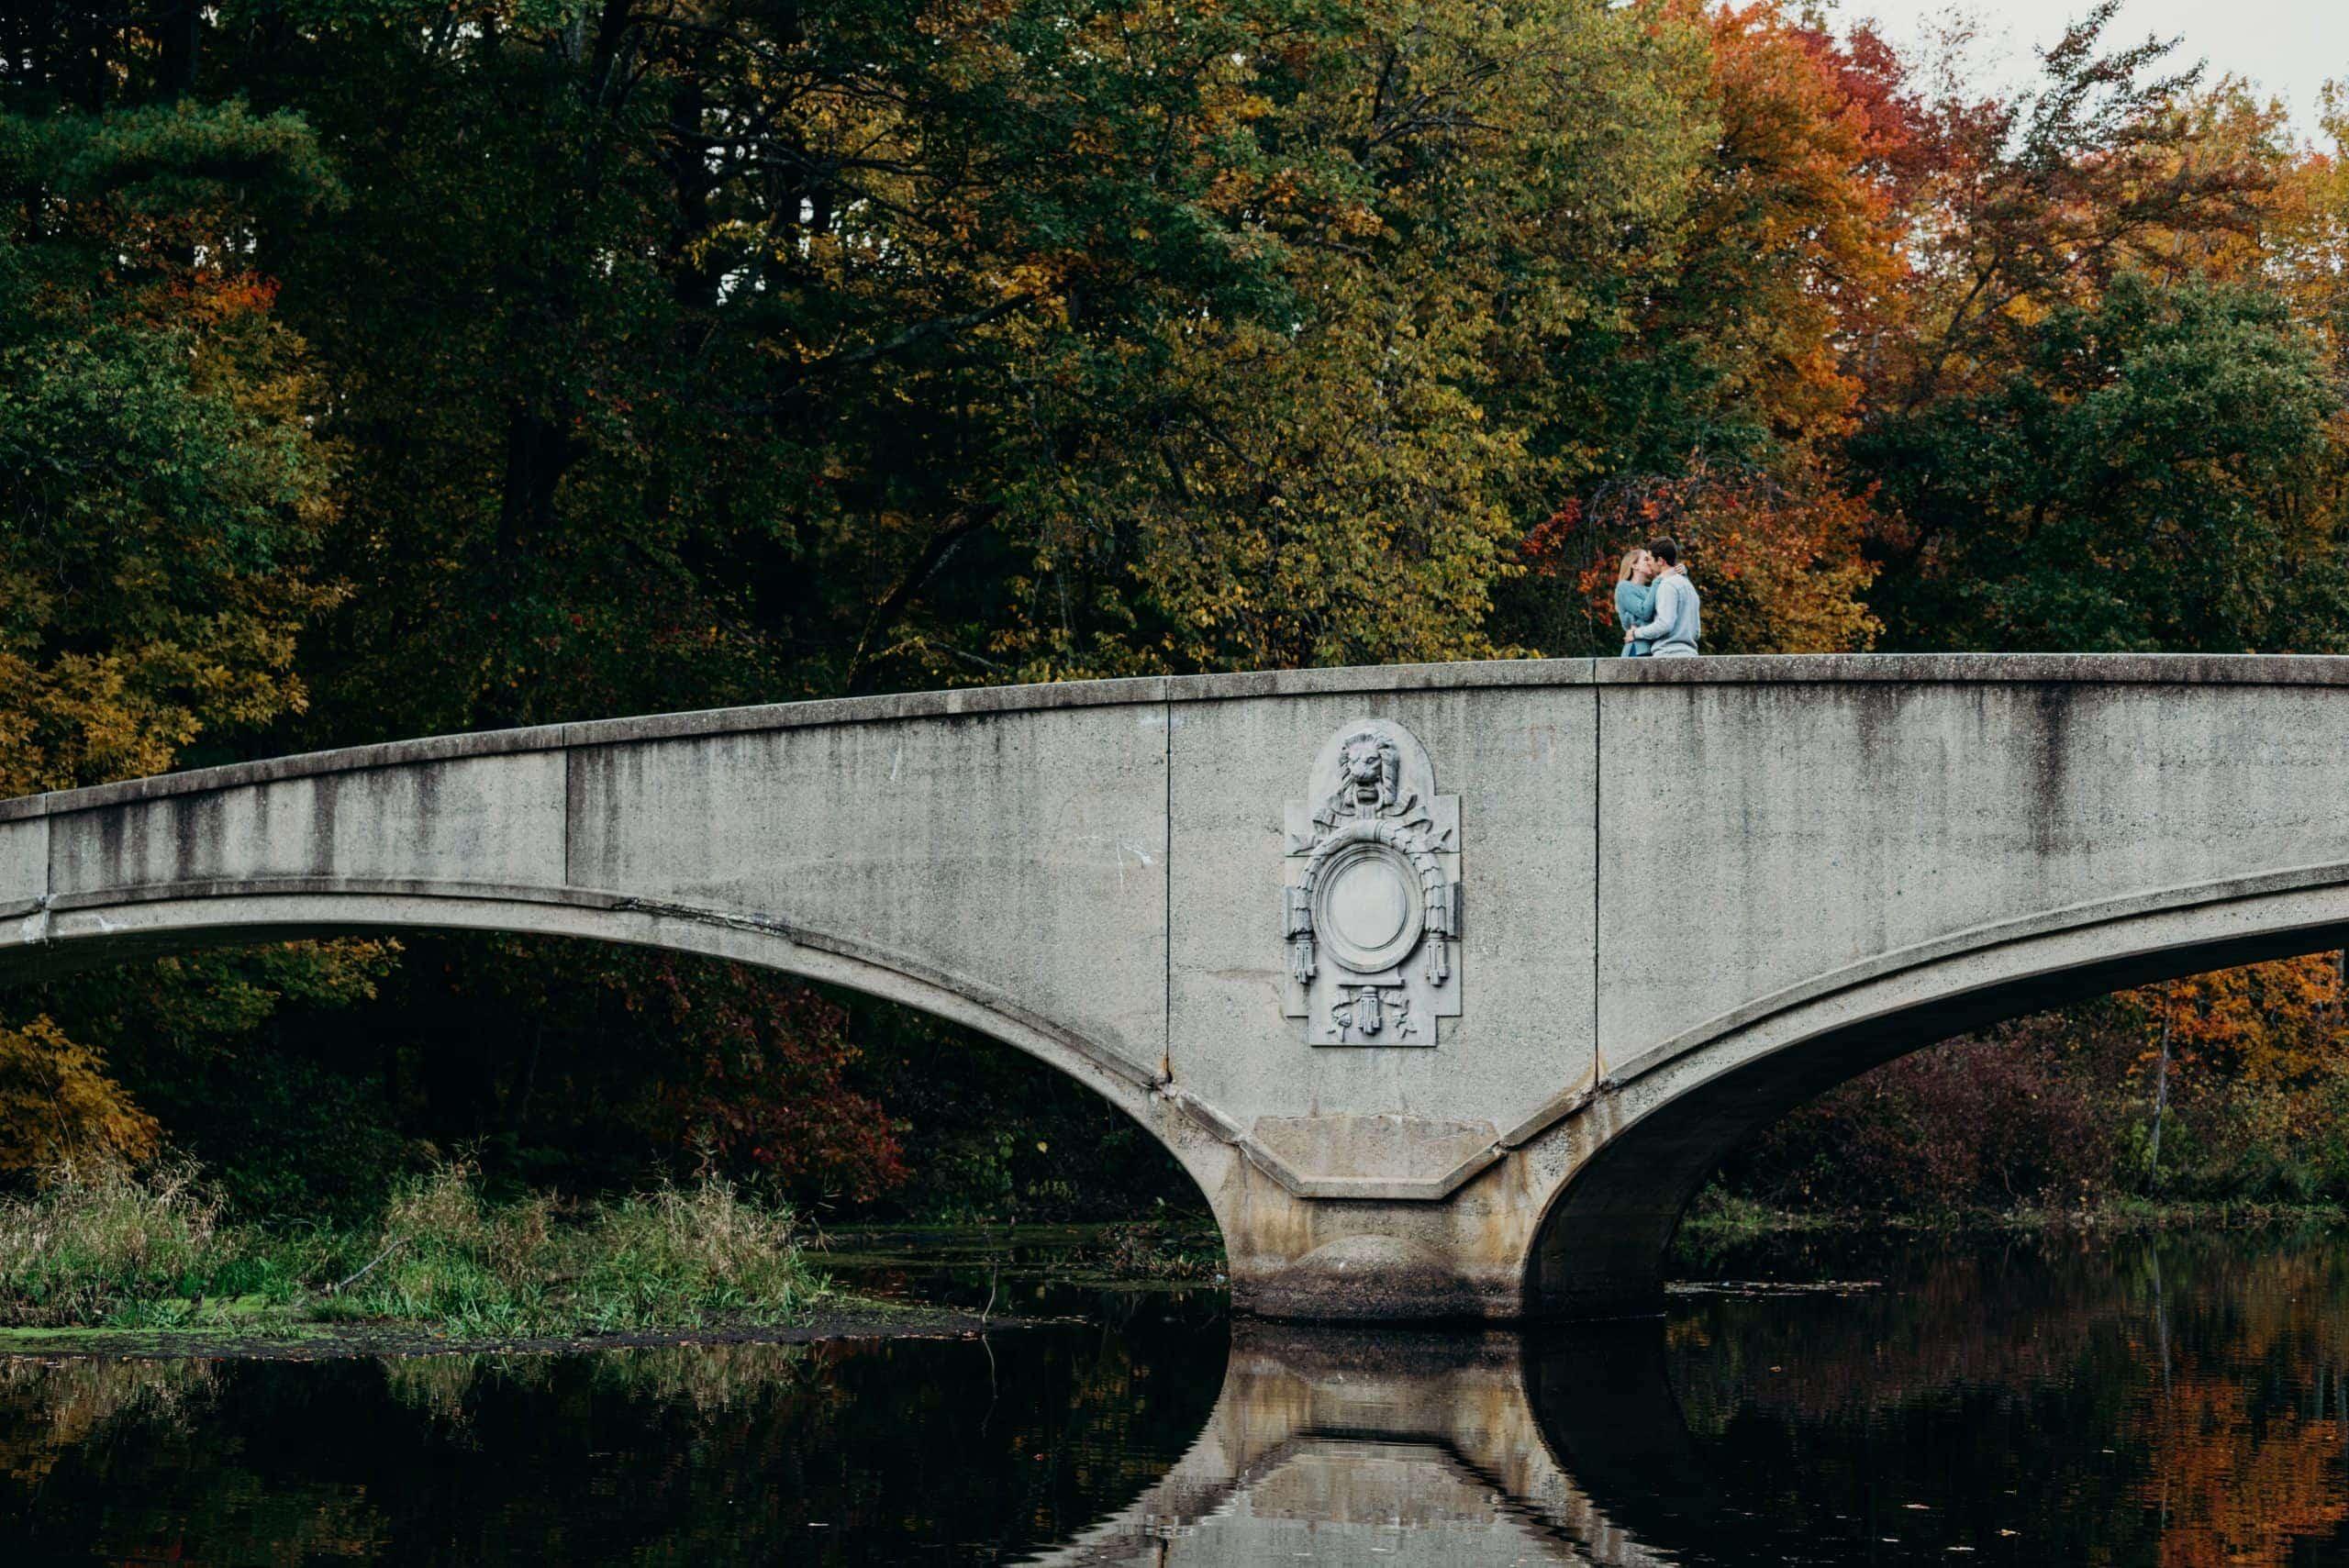 Far away shot of couple kissing on bridge at Wood Park in Hudson